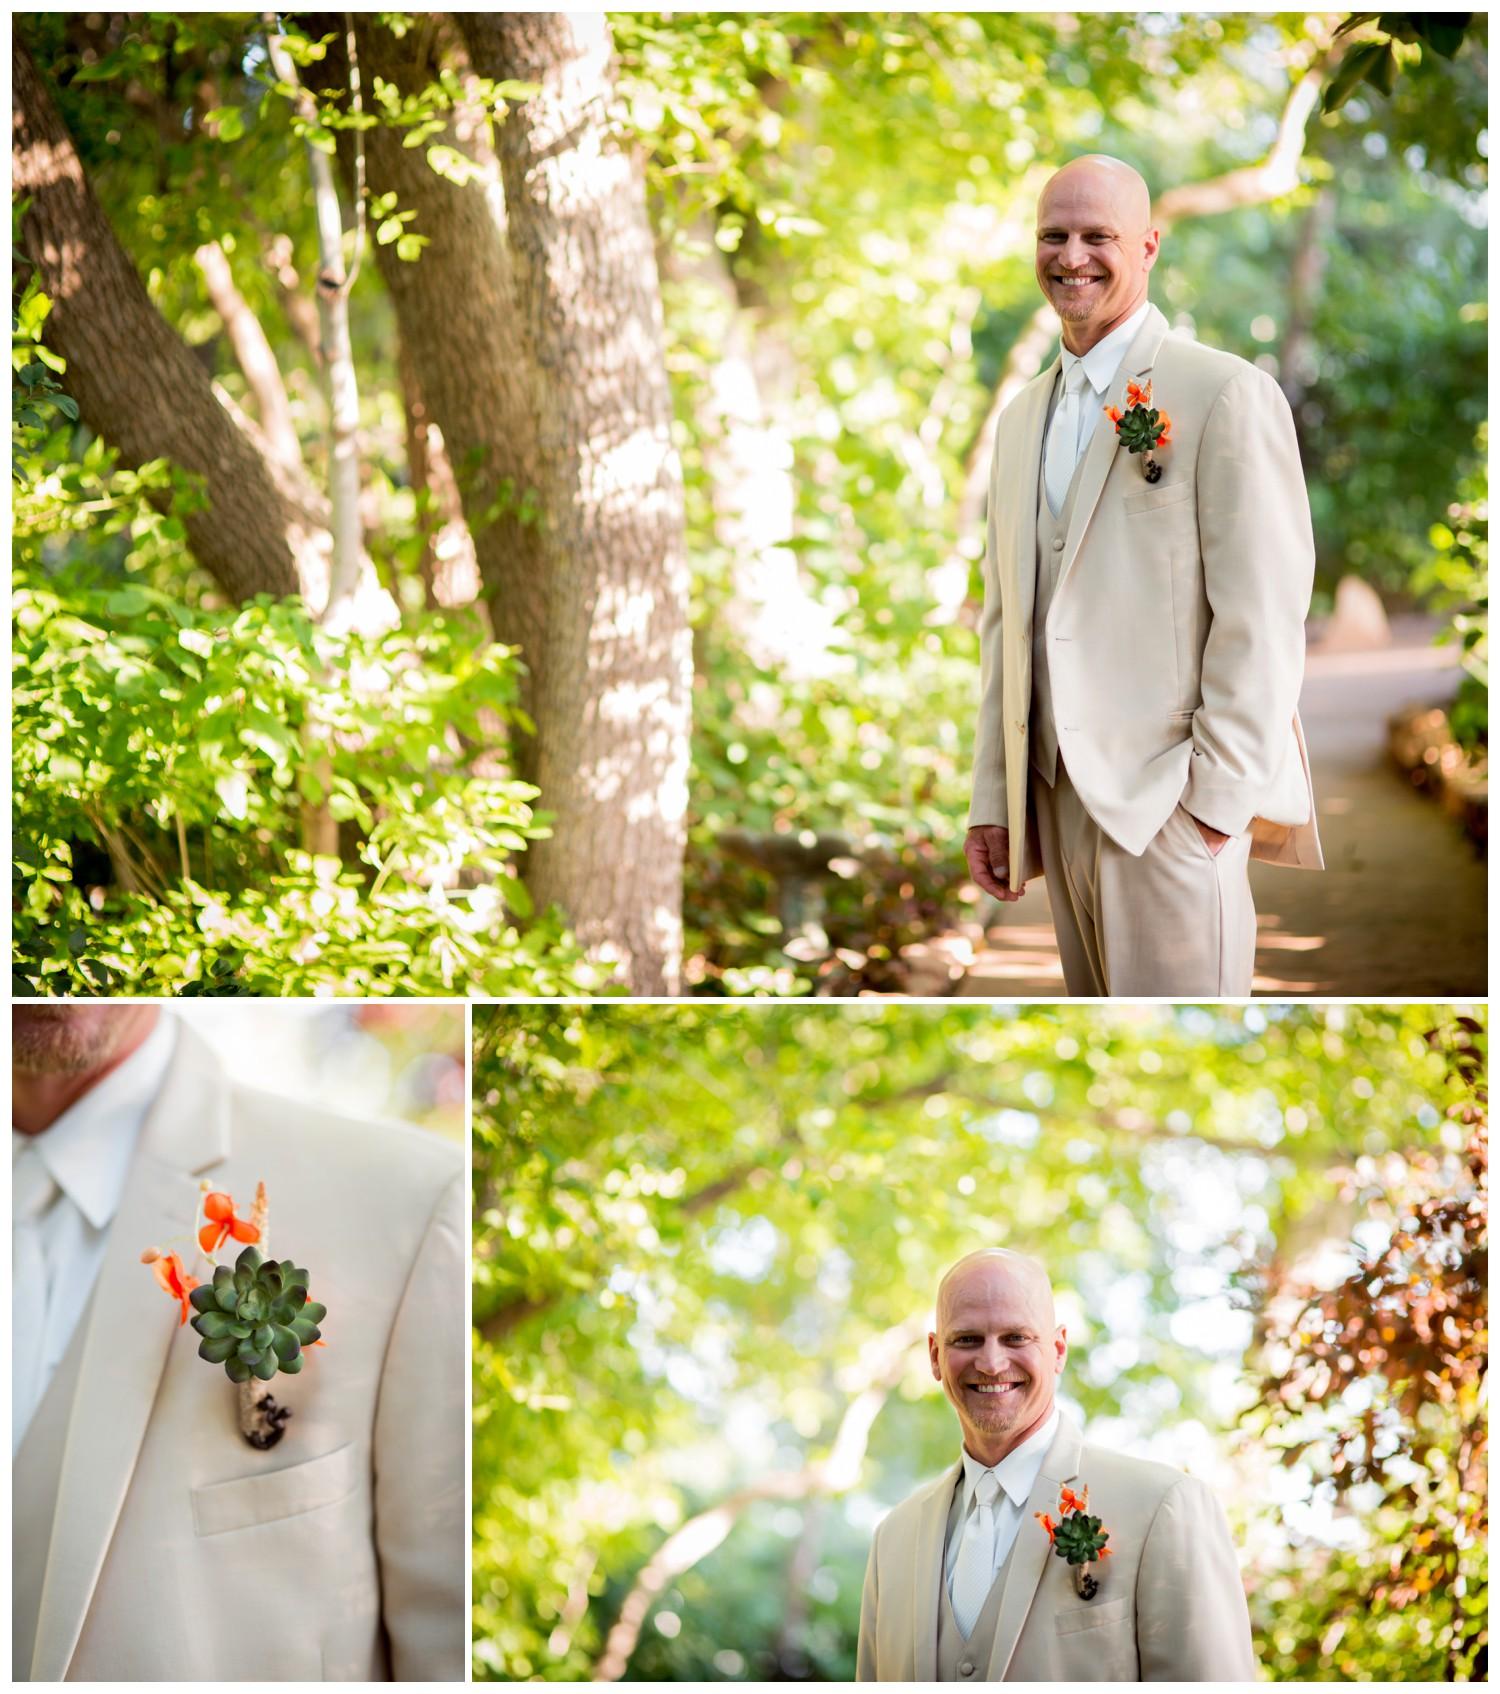 Morningside-manor-colorado-outdoor-wedding-photography_0047.jpg